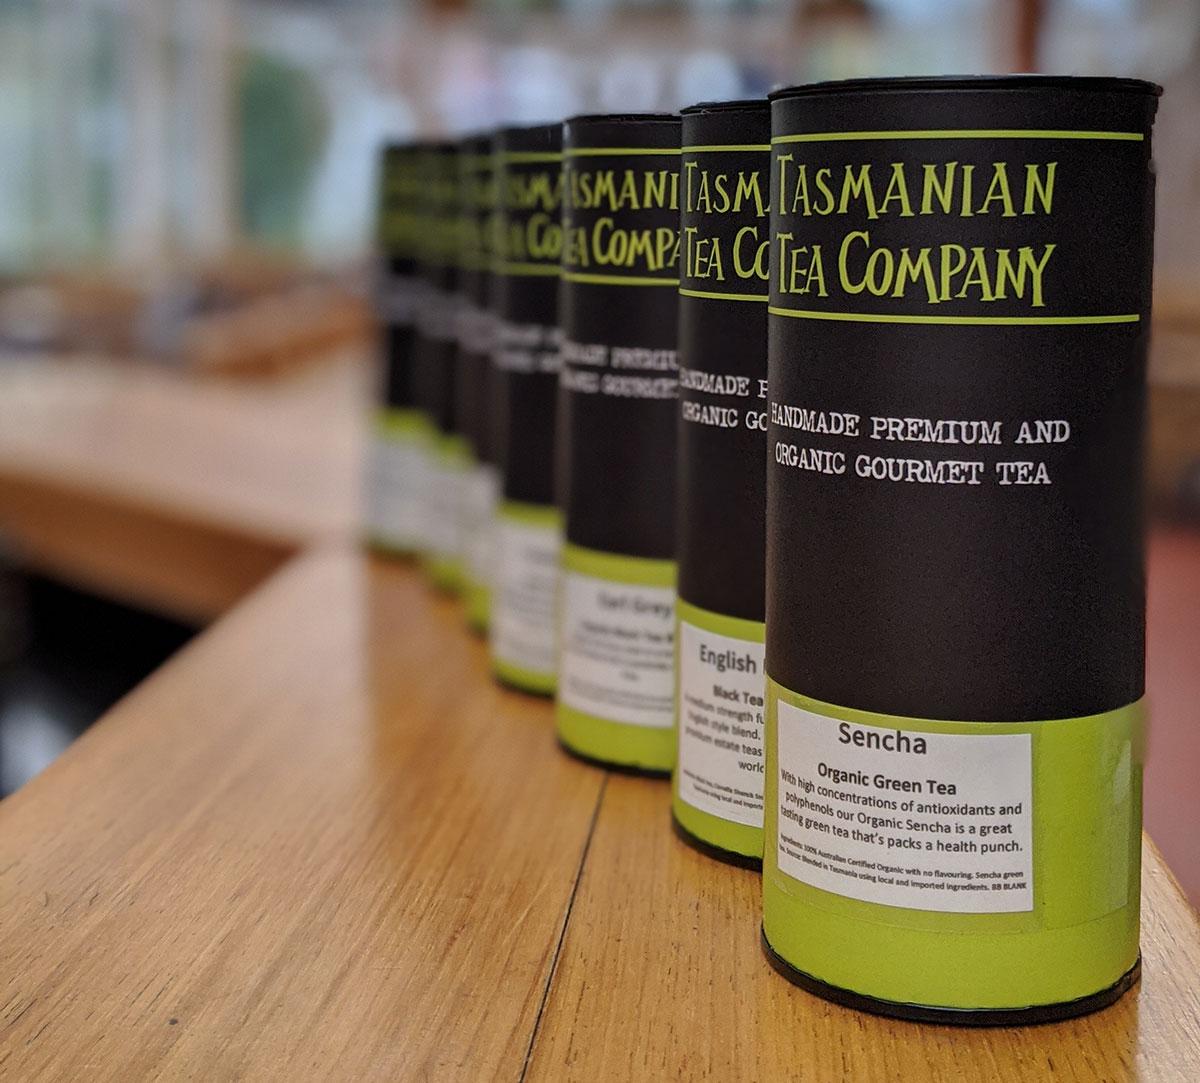 Tasmanian Tea Company